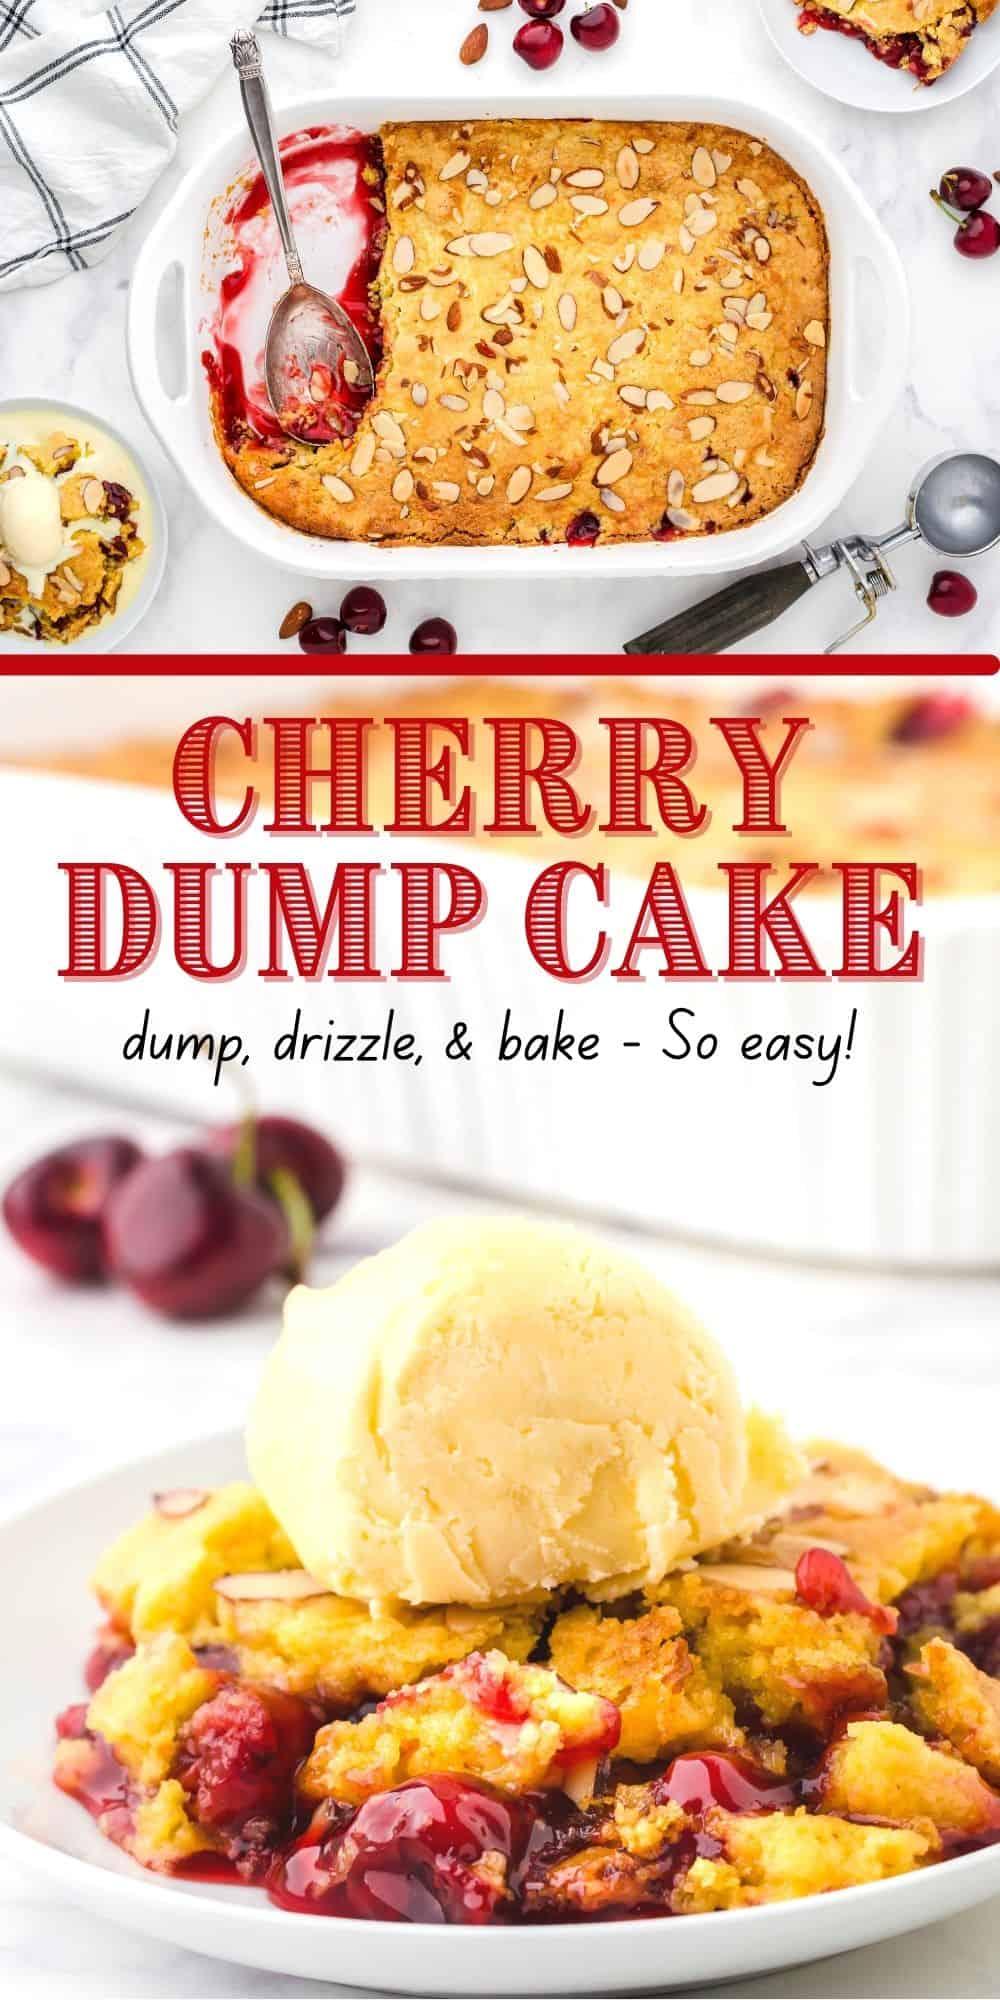 How to Make Cherry Dump Cake Recipe